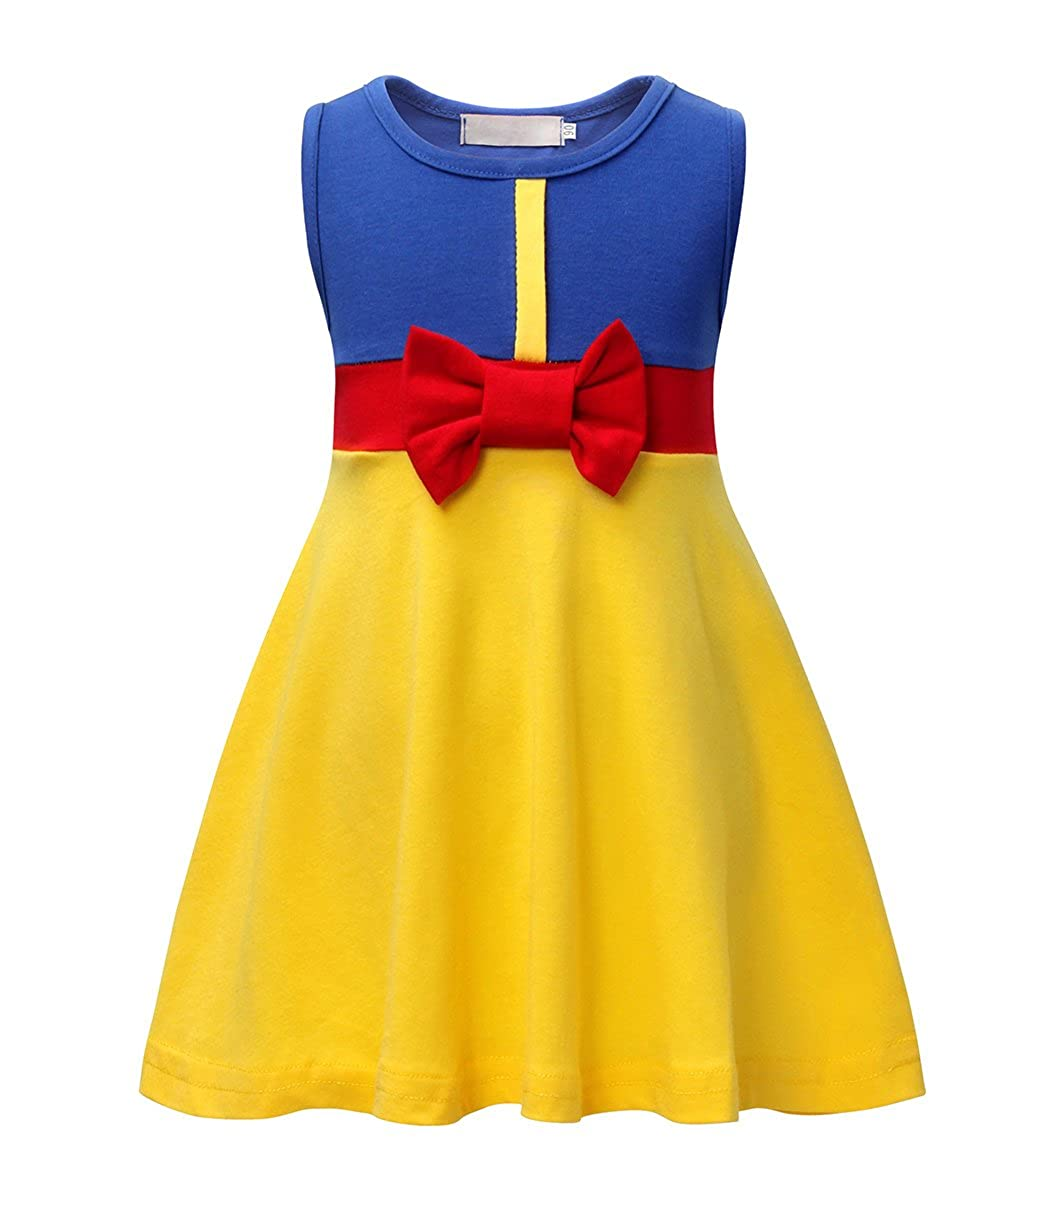 AmzBarley Snow White Dress Princess Costume Baby Girls Birthday Party Cape Bowknot G039-CA